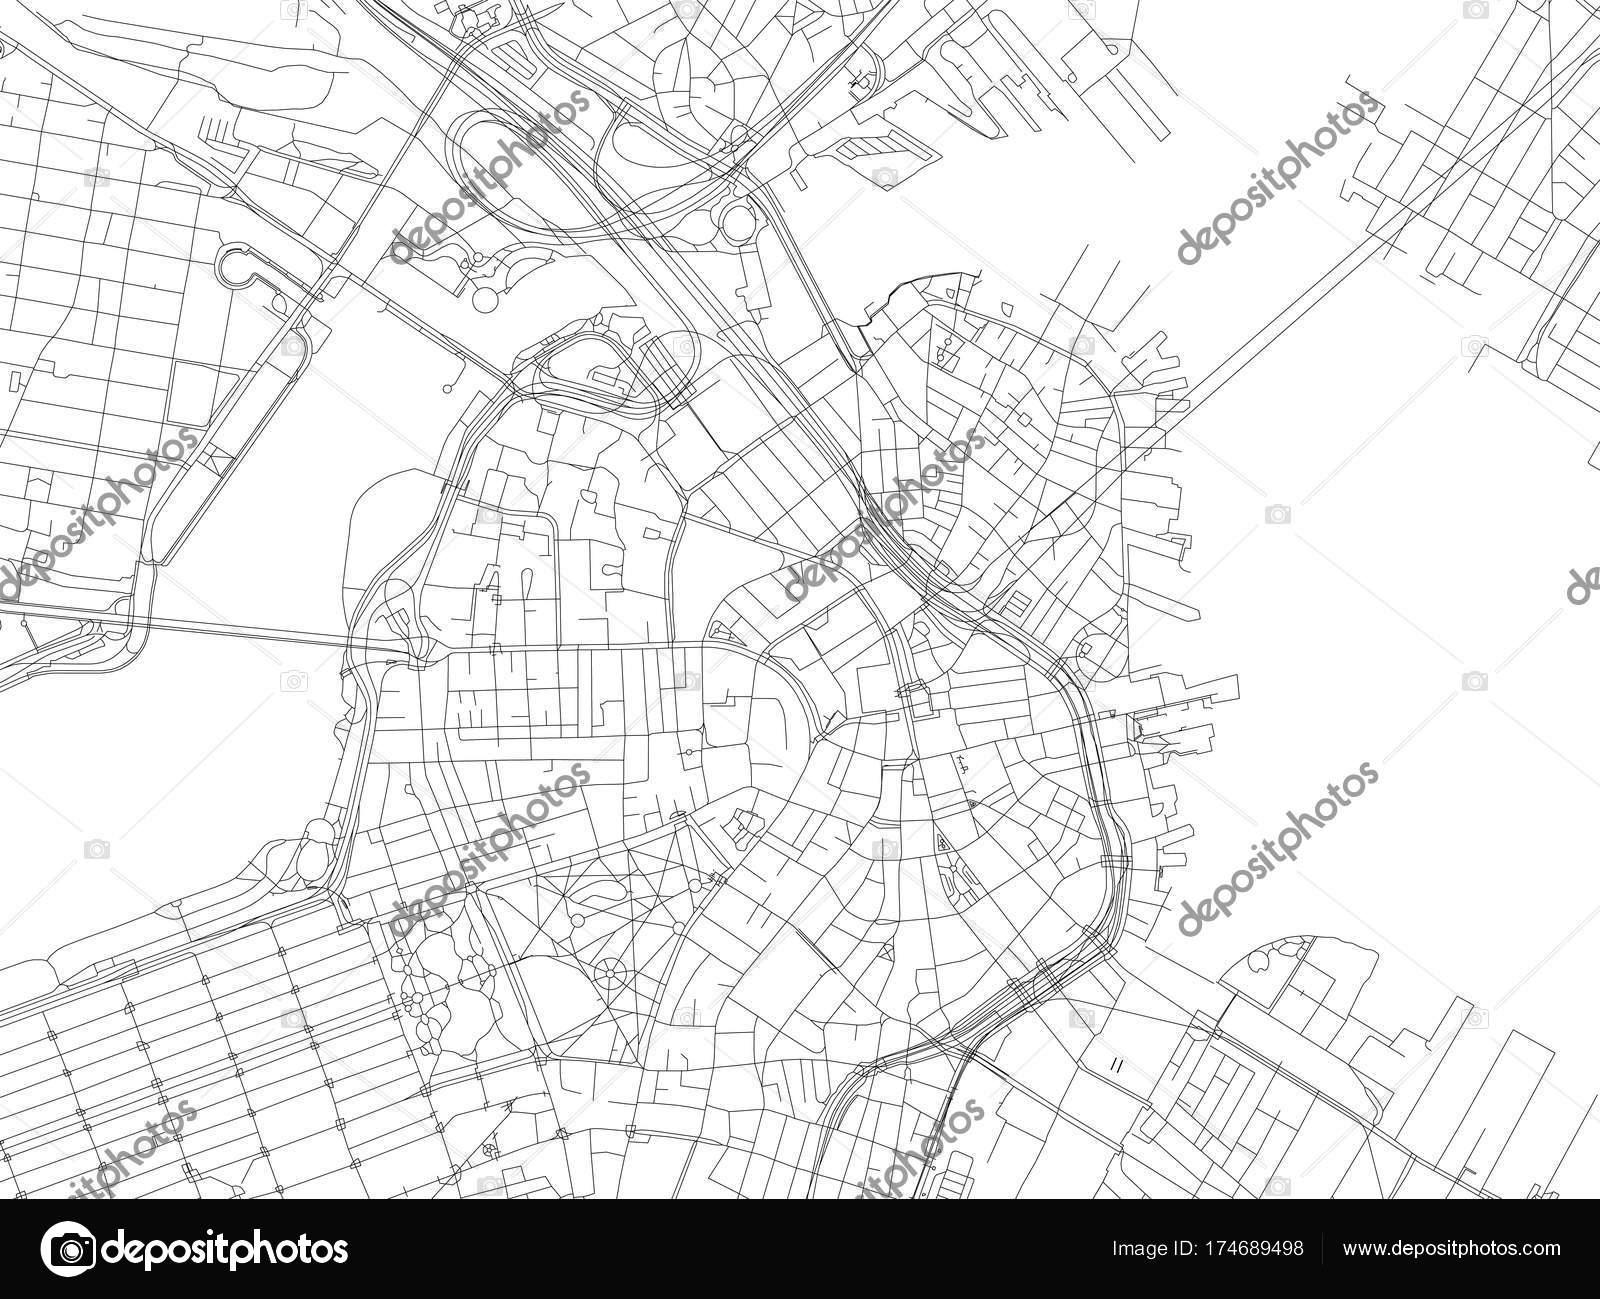 1600x1299 Streets Of Boston, City Map, Massachusetts, United States. Street